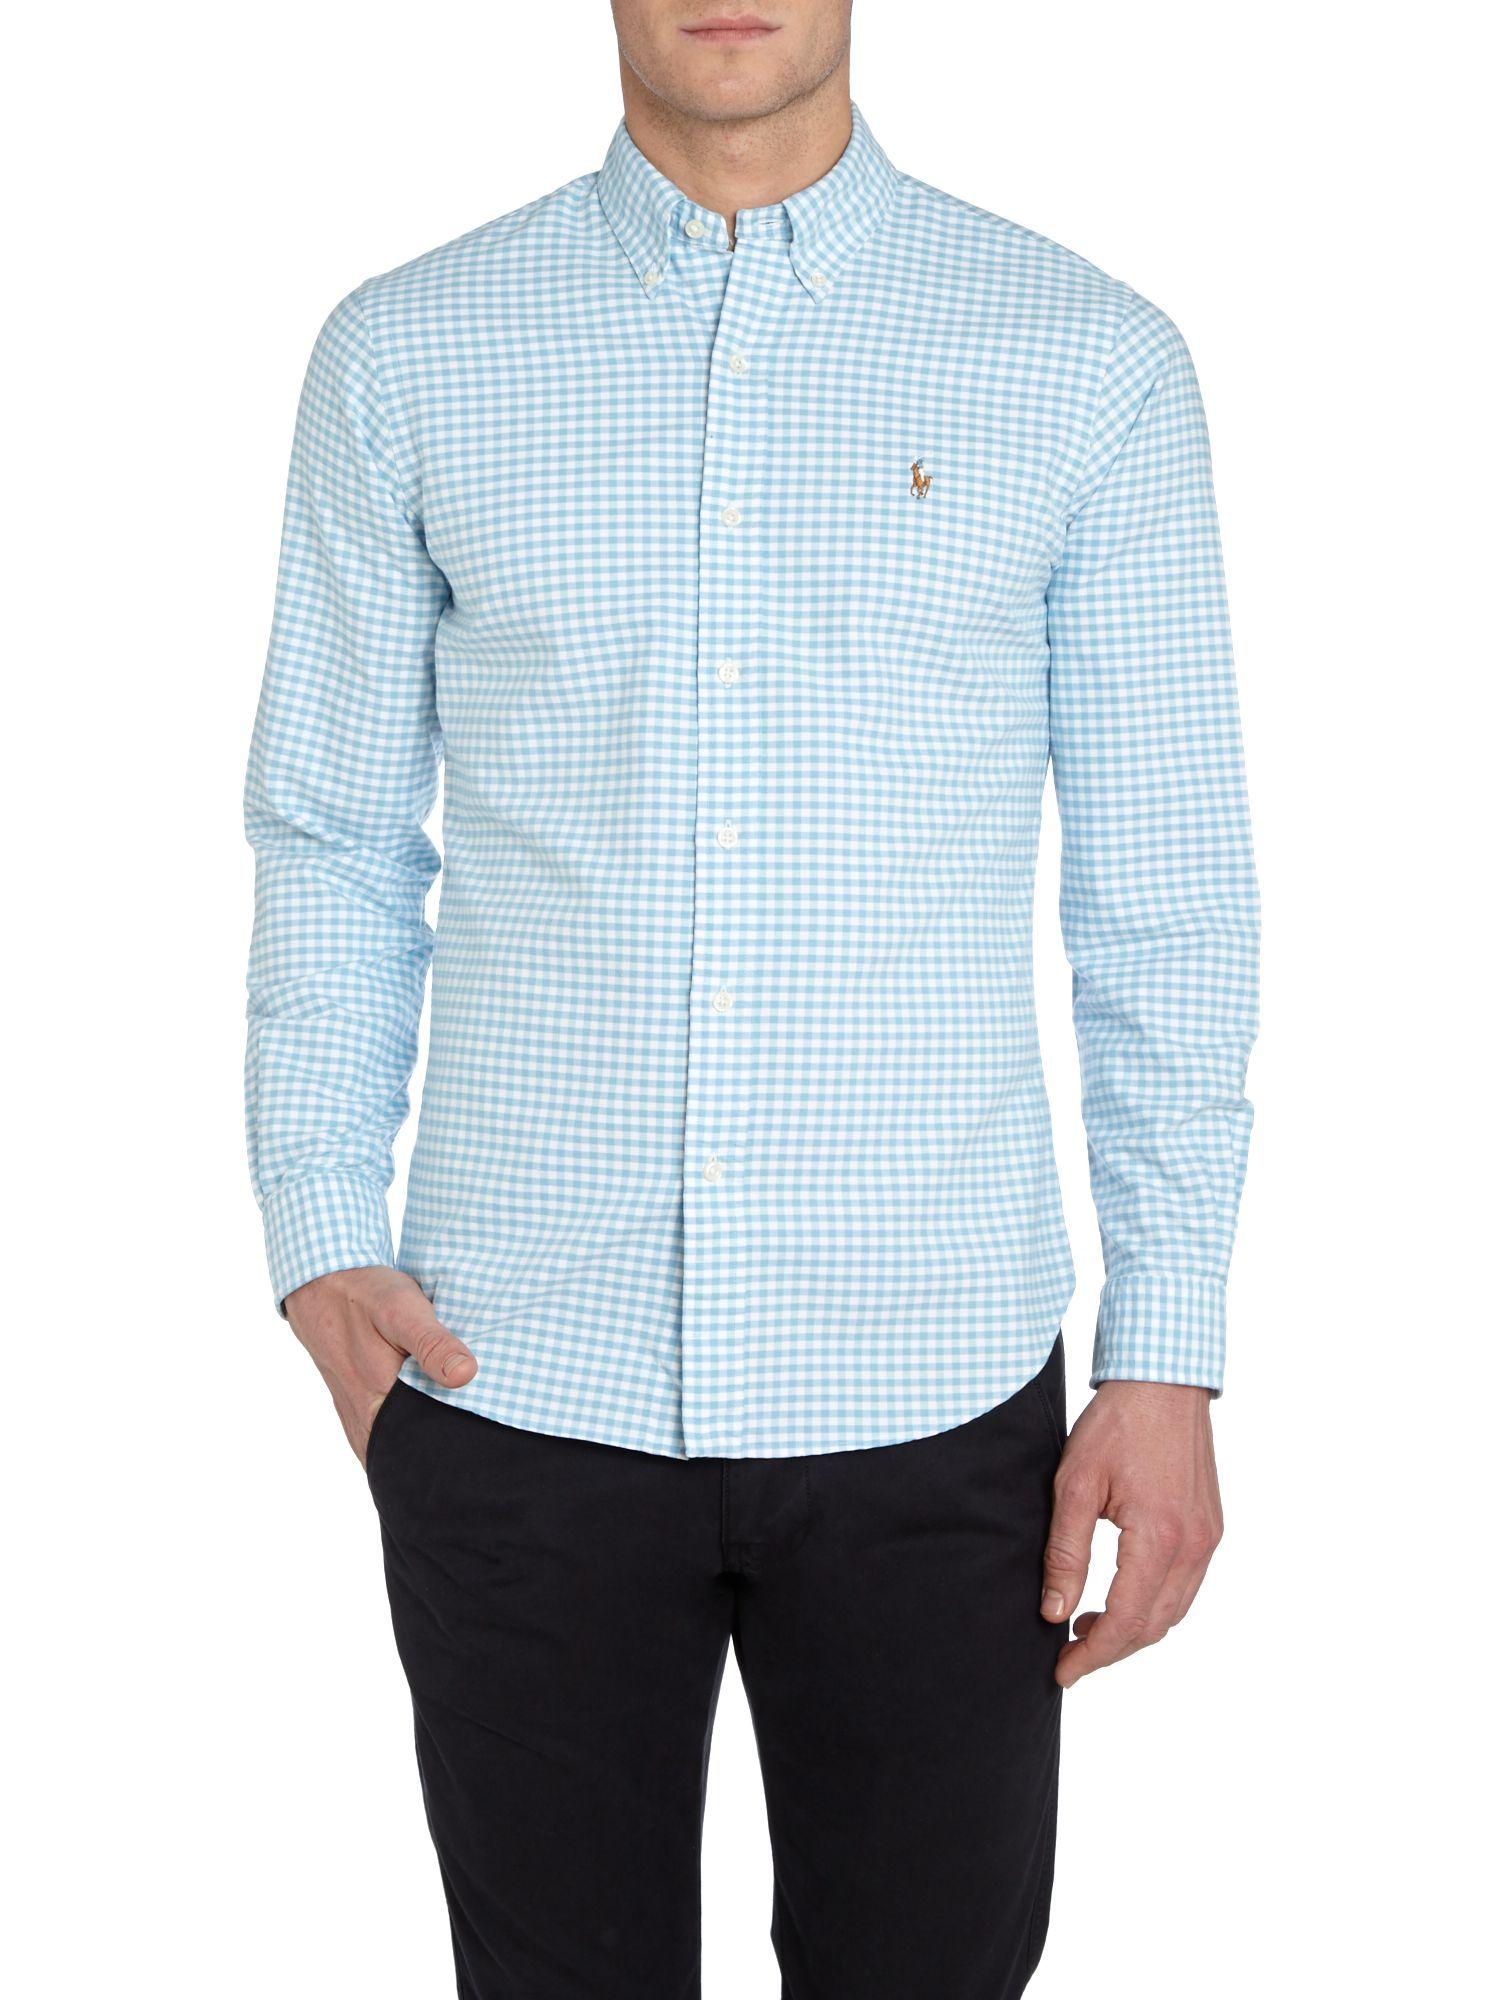 Polo Ralph Lauren Classic Slim Fit Long Sleeve Gingham Shirt